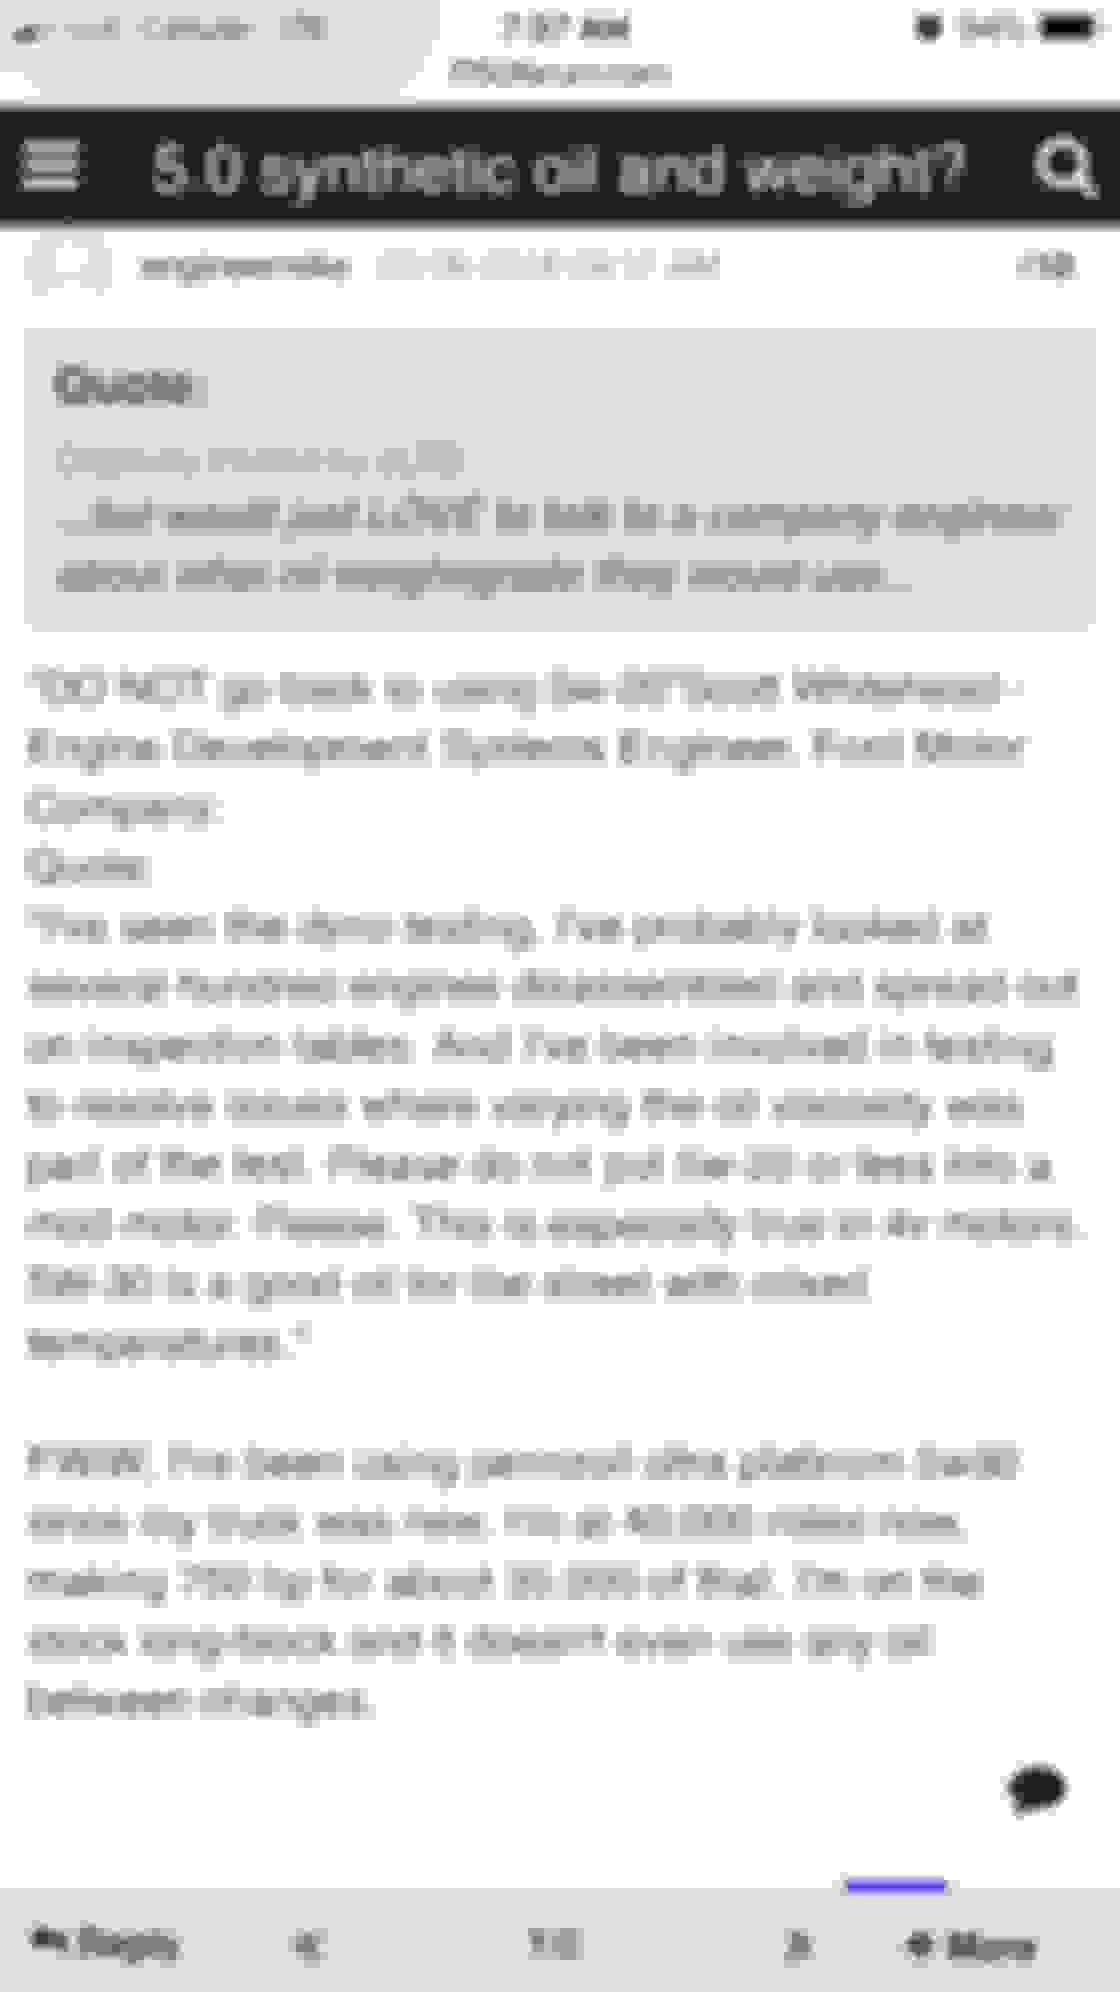 5w20 Vs 5w30 >> Anyone Using 5w30 Or 0w30 Page 2 Ford F150 Forum Community Of